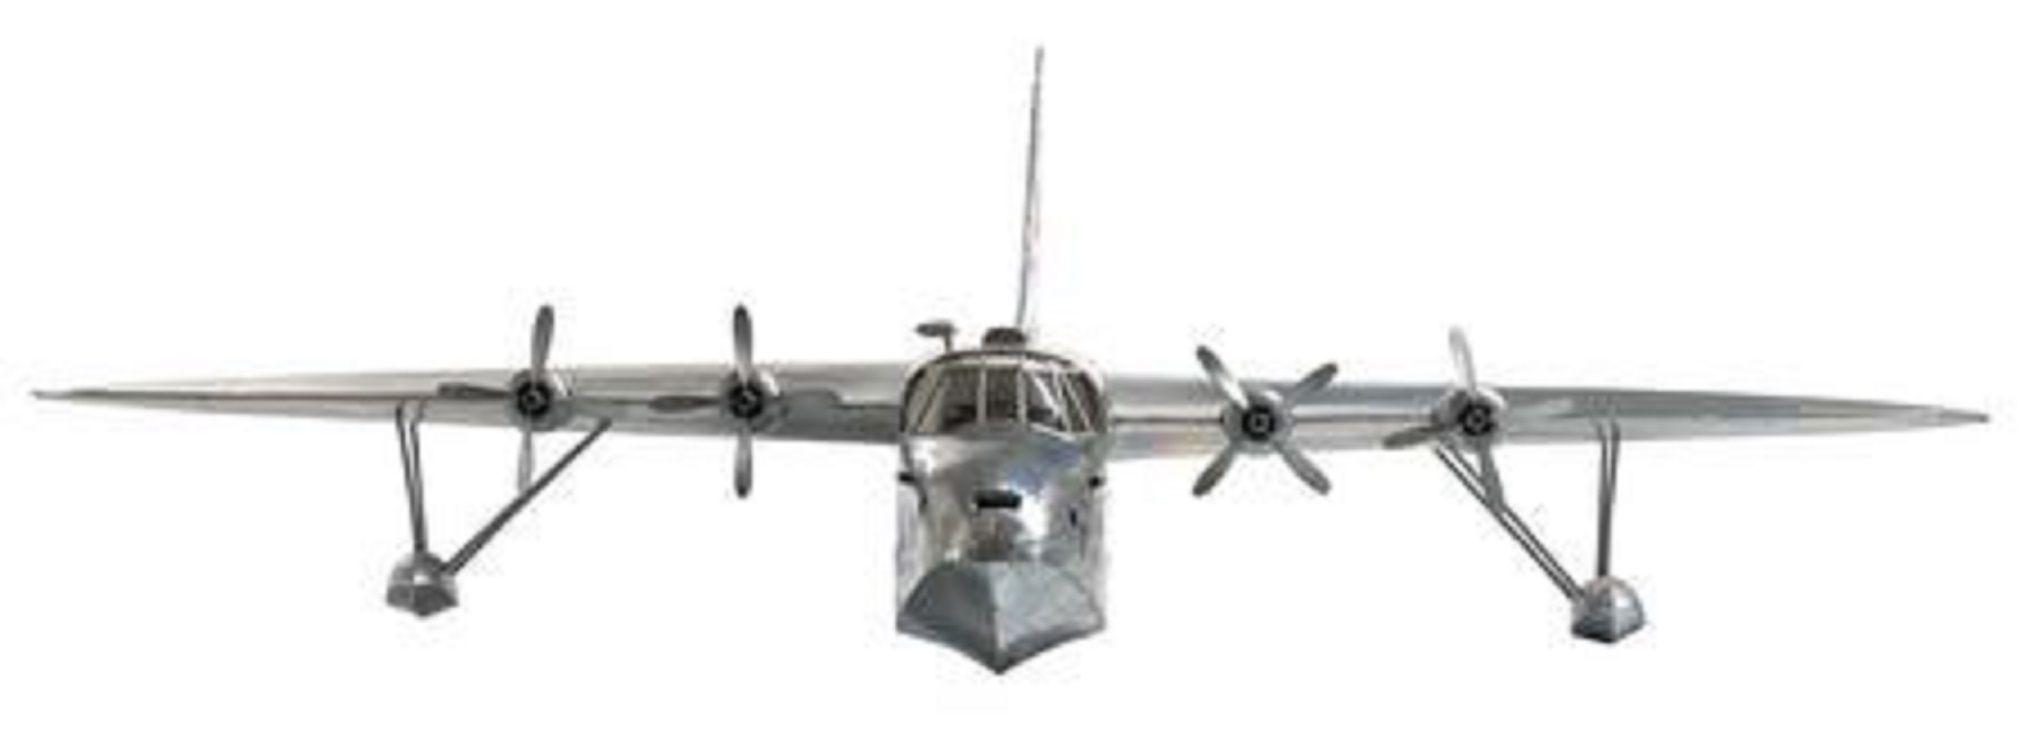 213-6888-Aquila-Airways-Model-Plane-Premier-Range